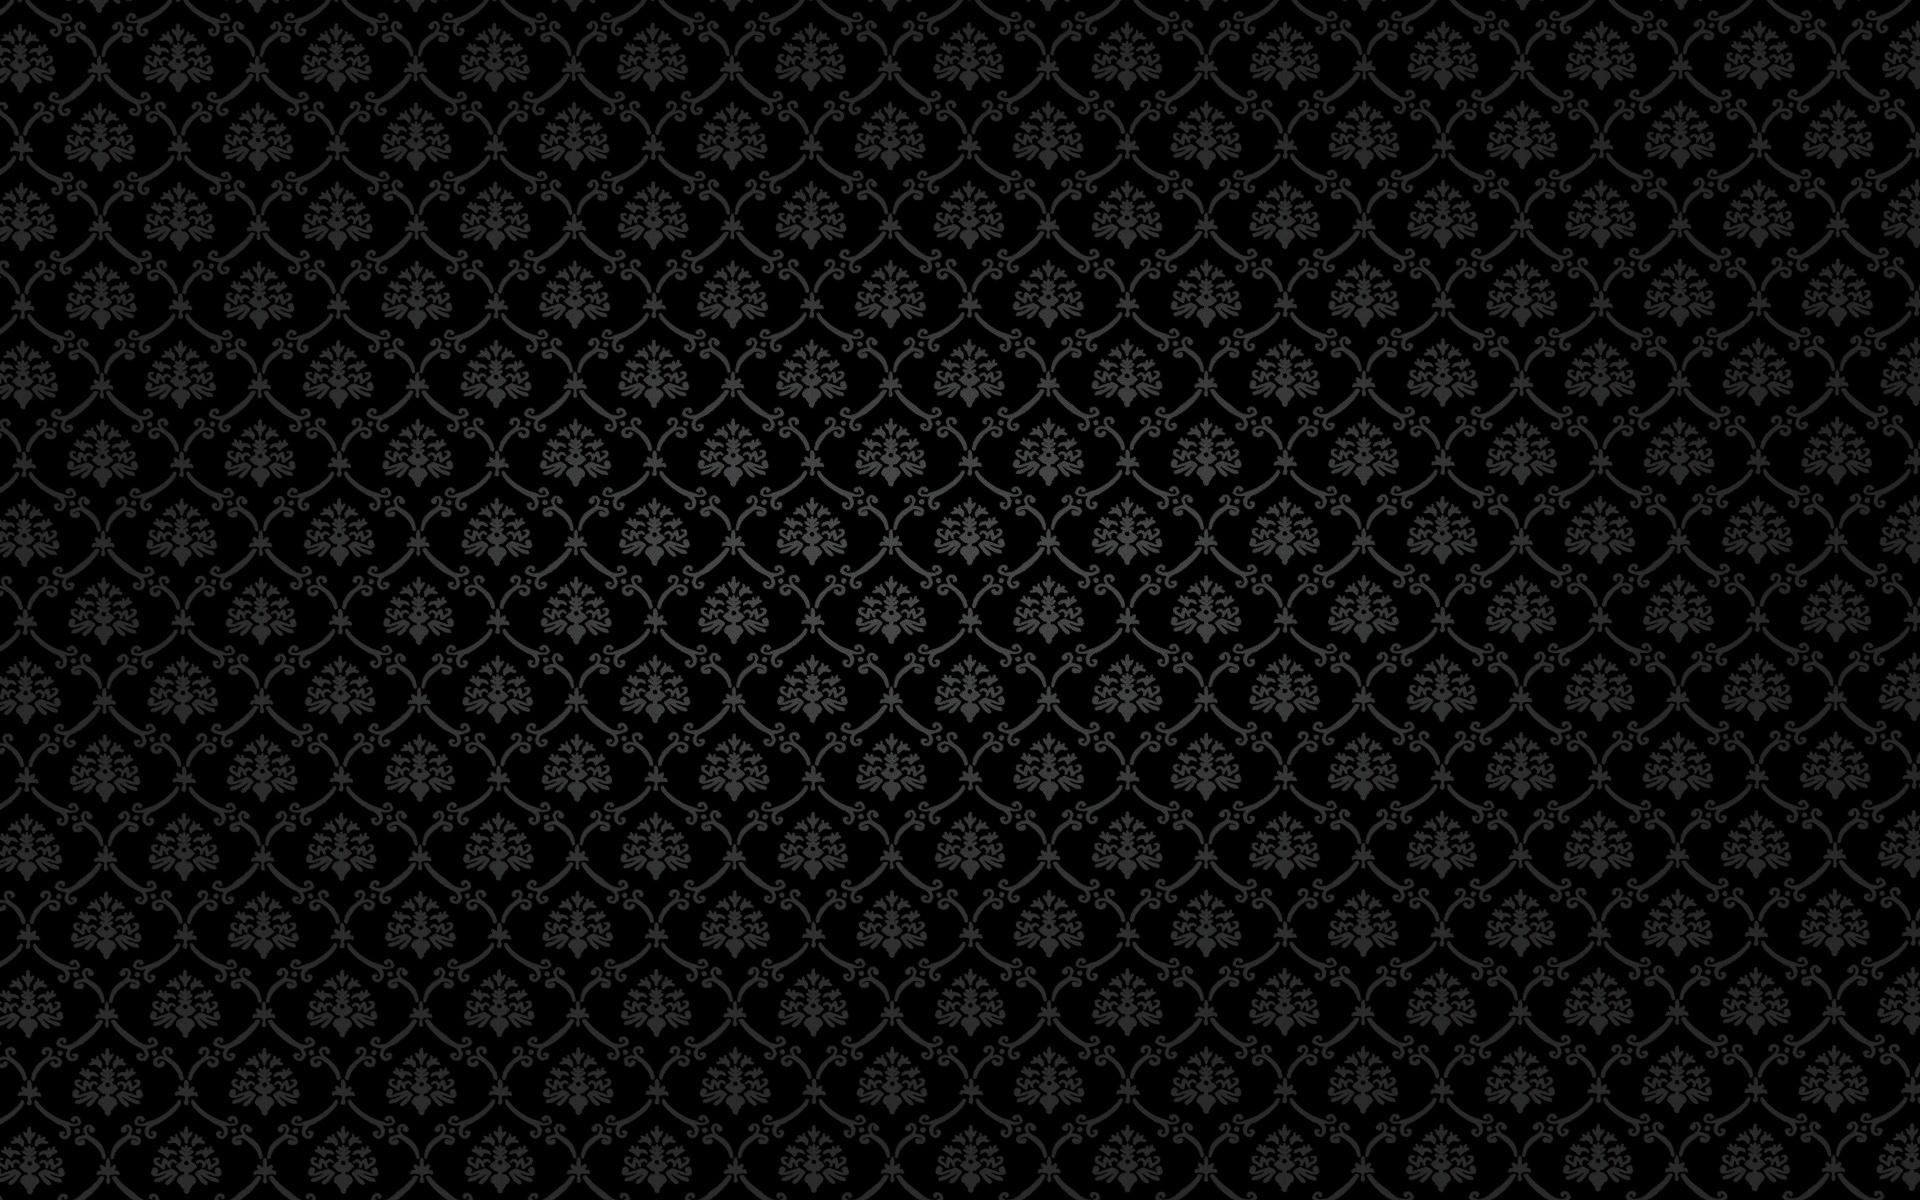 Ornamental Full Hd Wallpaper And Background 1920x1200